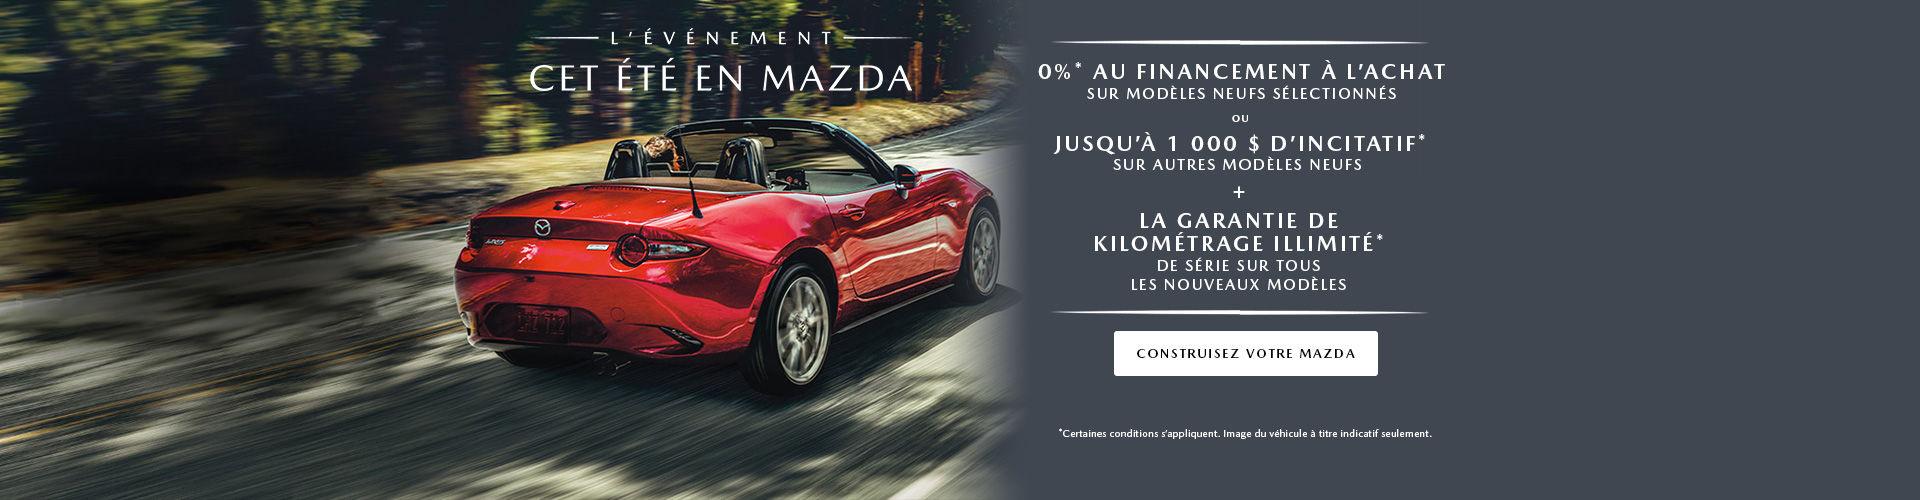 Événement Mazda